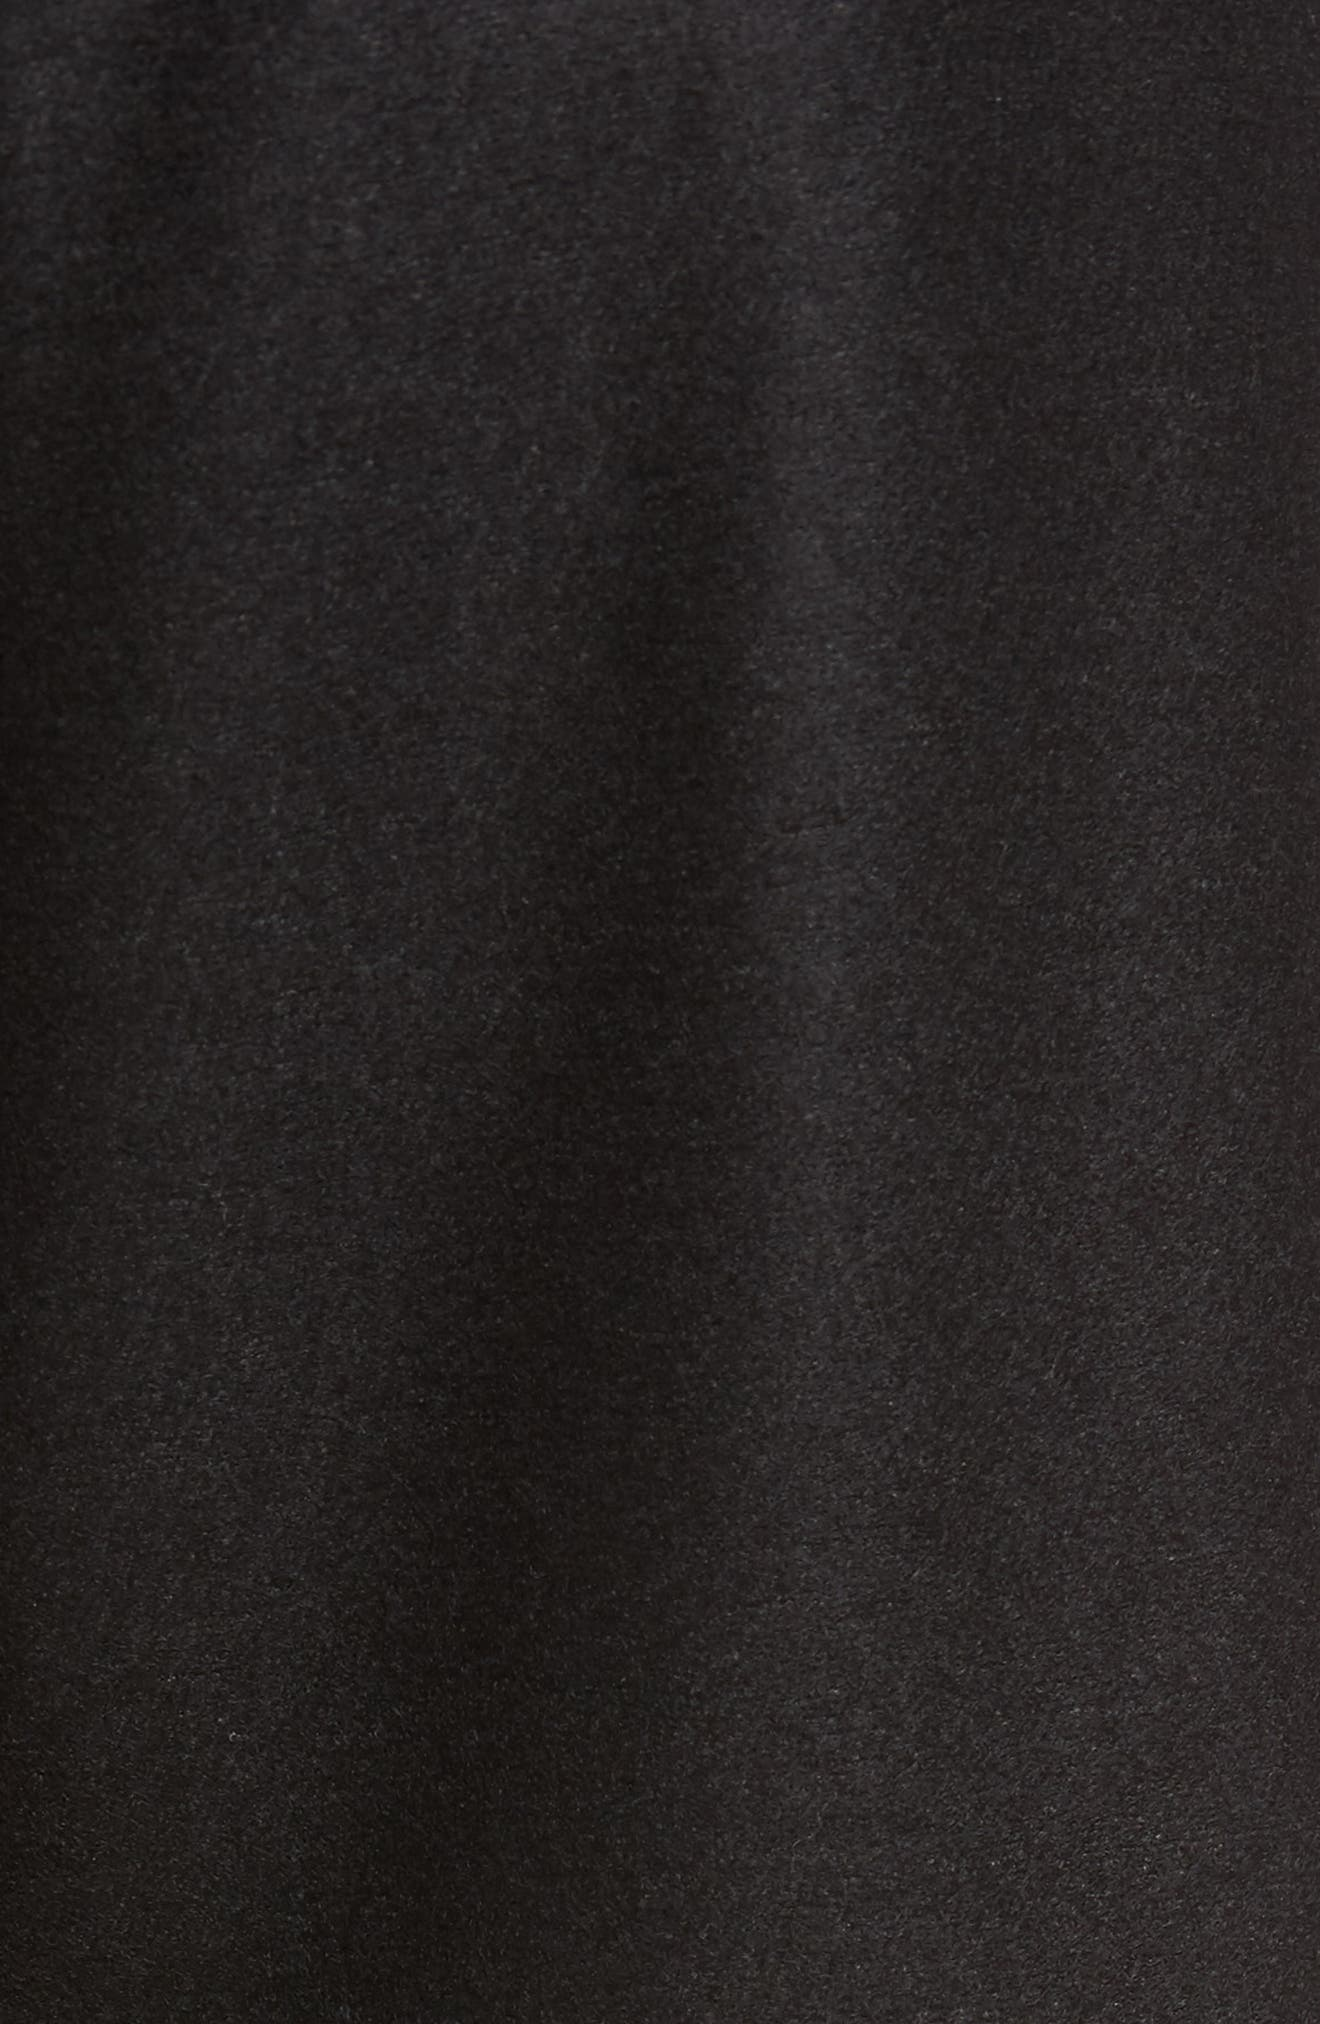 Drawstring Waist Pants,                             Alternate thumbnail 5, color,                             001